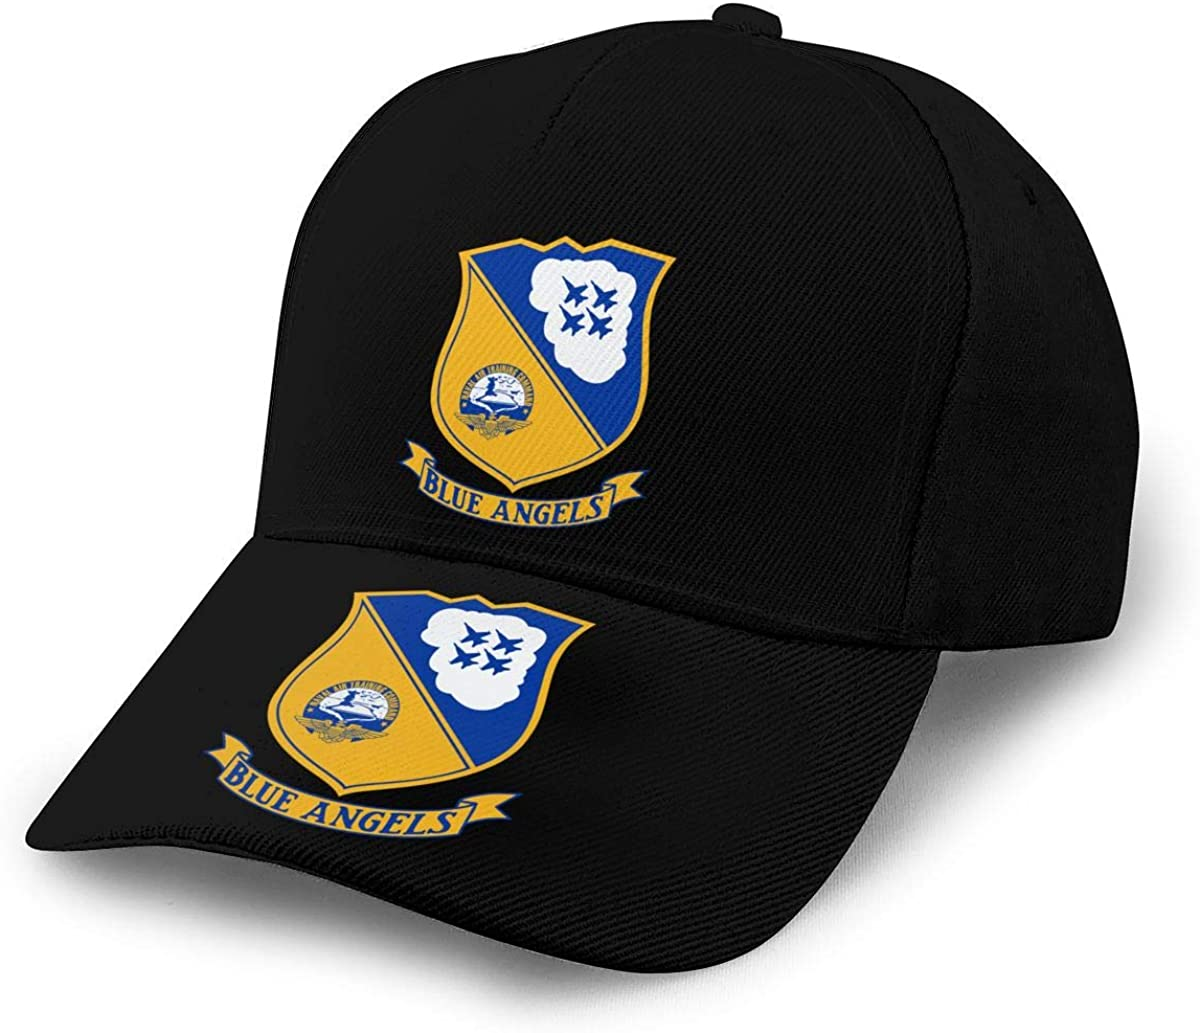 US Navy Blue Angels Unisex Adult Hats Classic Baseball Caps Peaked Cap